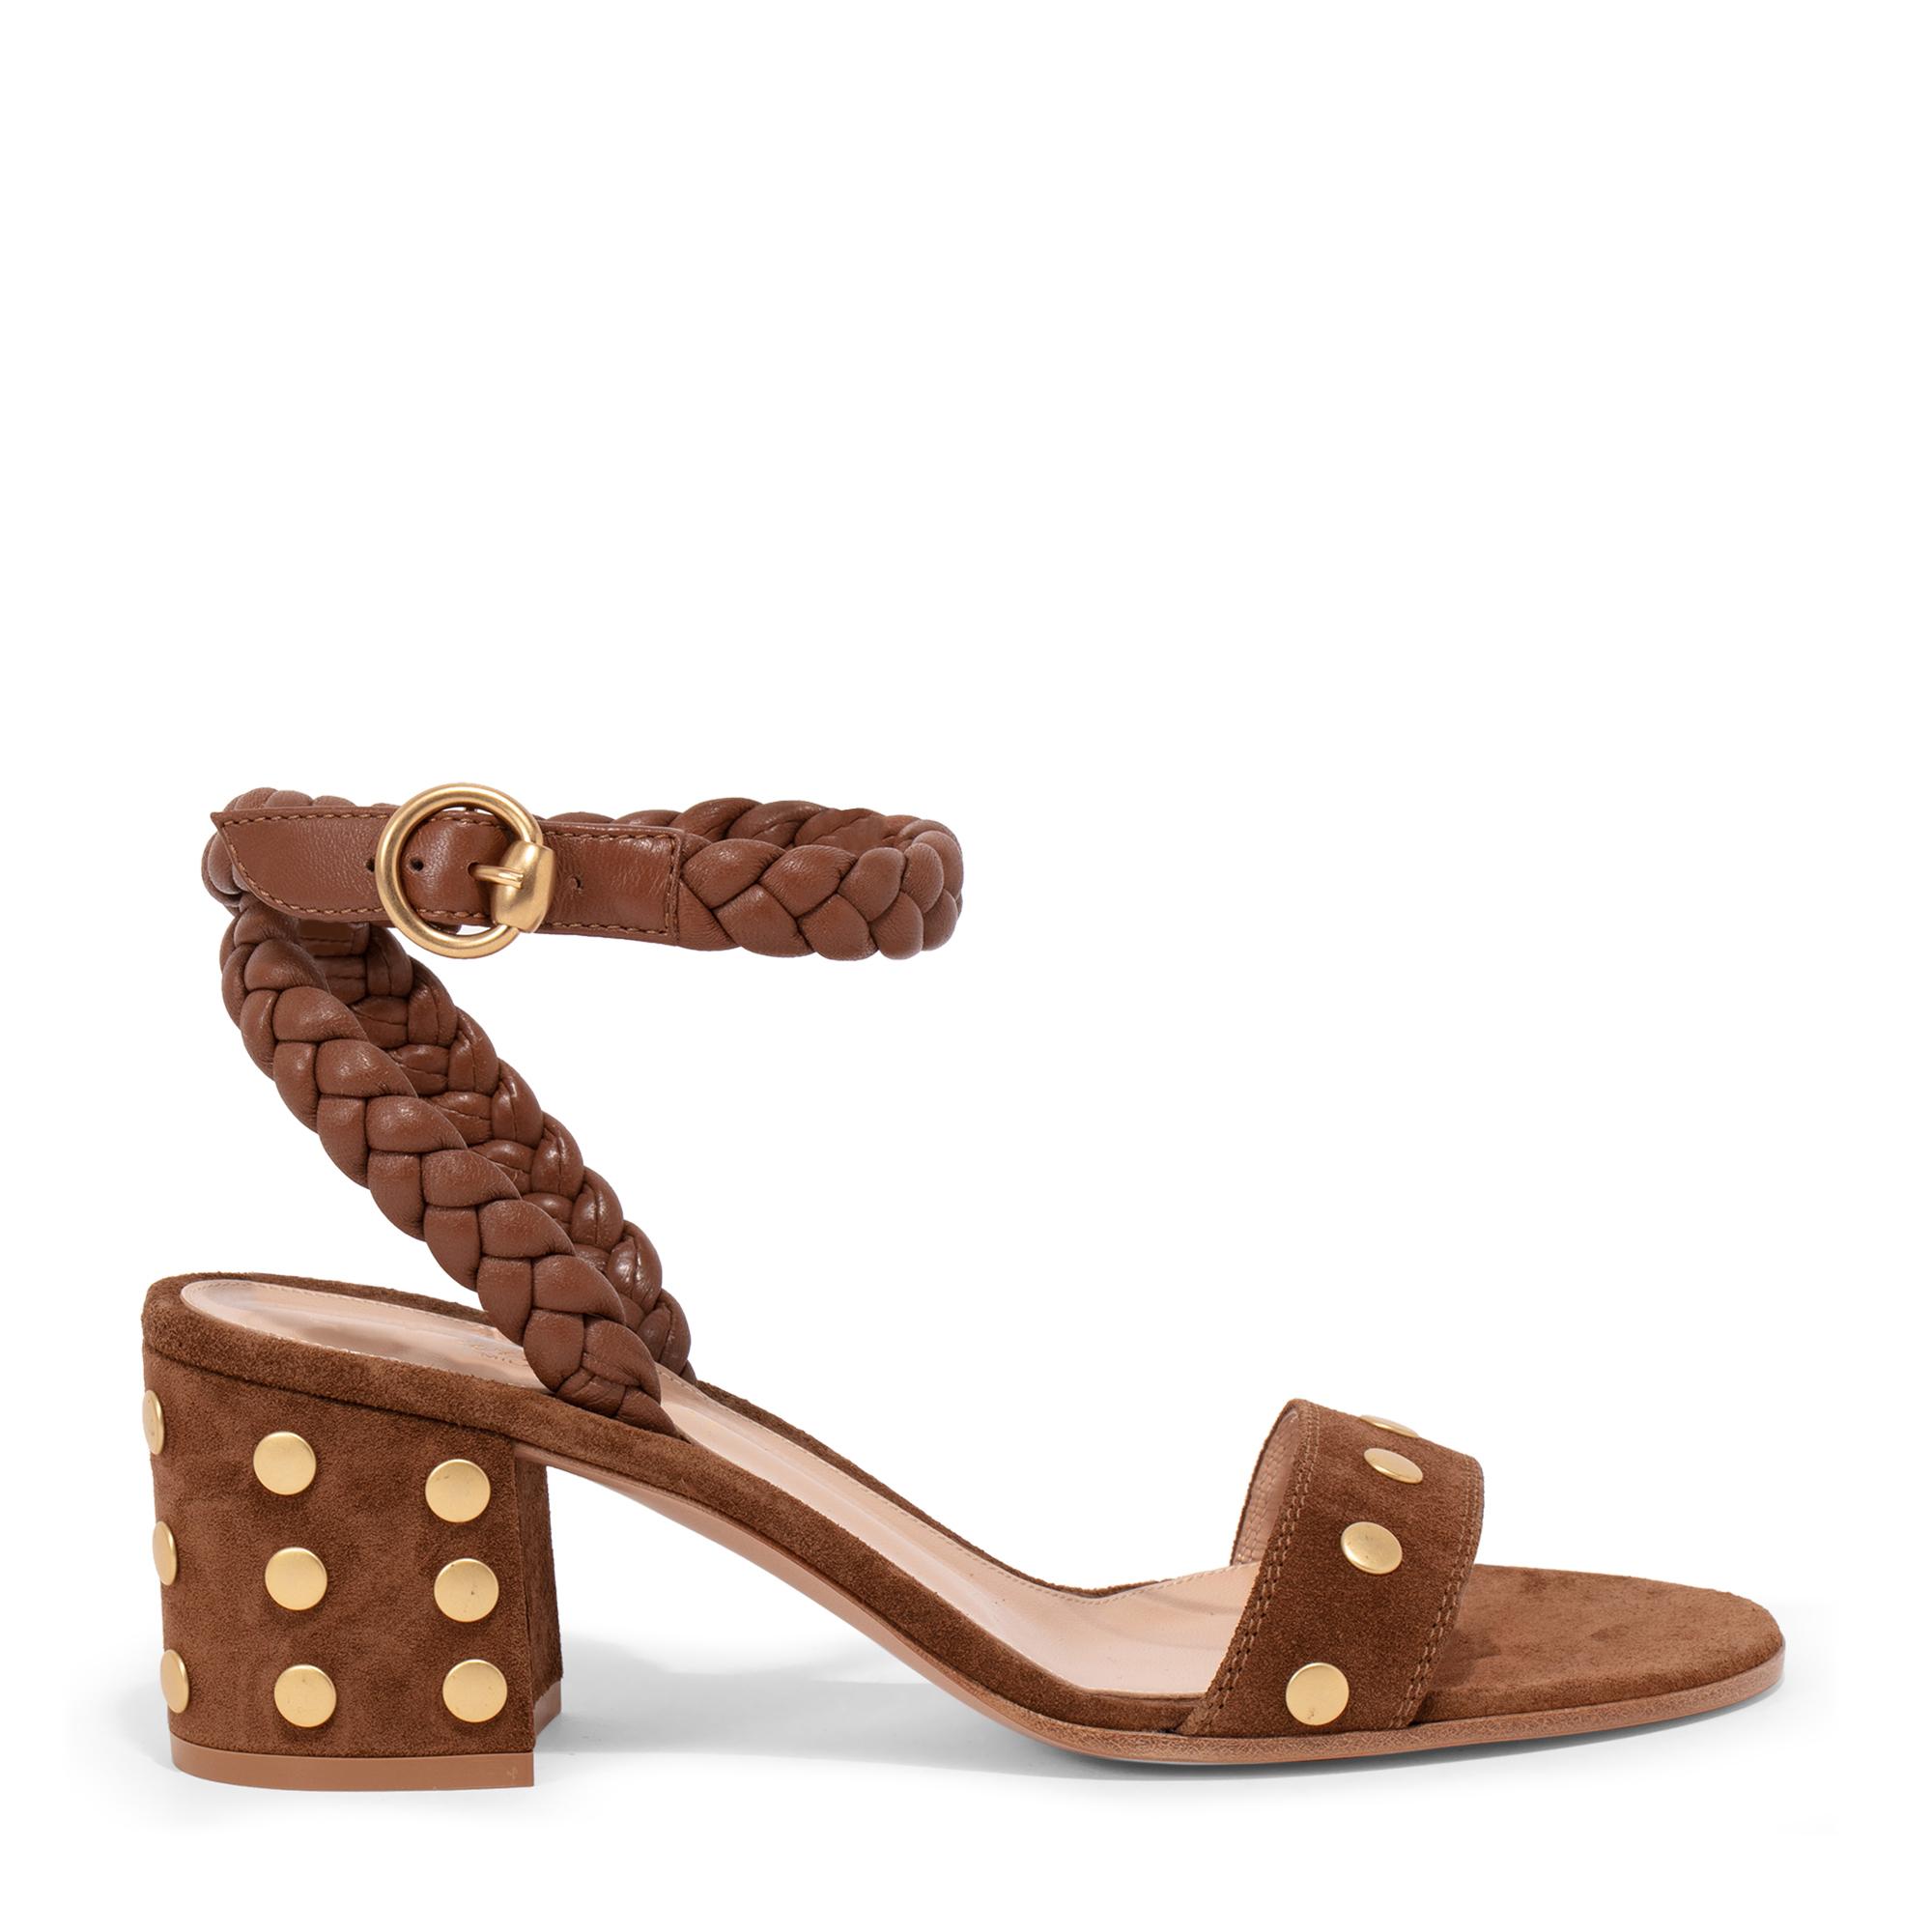 60 suede sandals